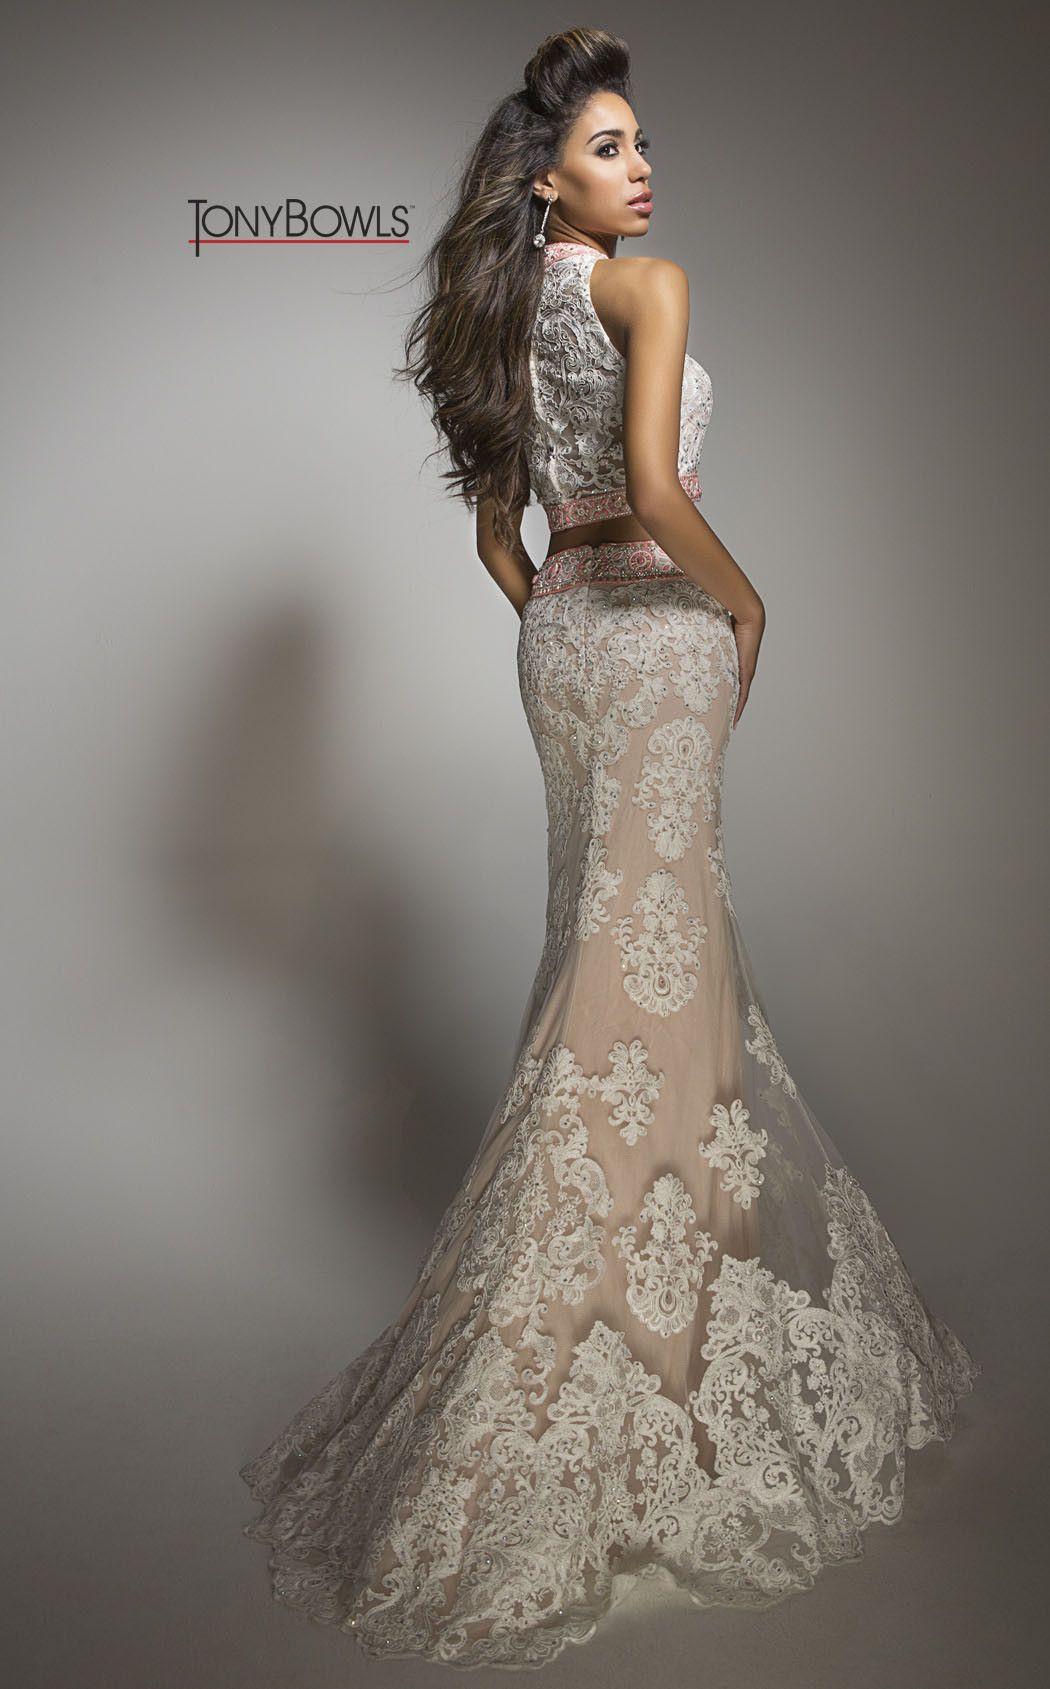 Tony bowls lace piece prom dress gowns pinterest prom tony